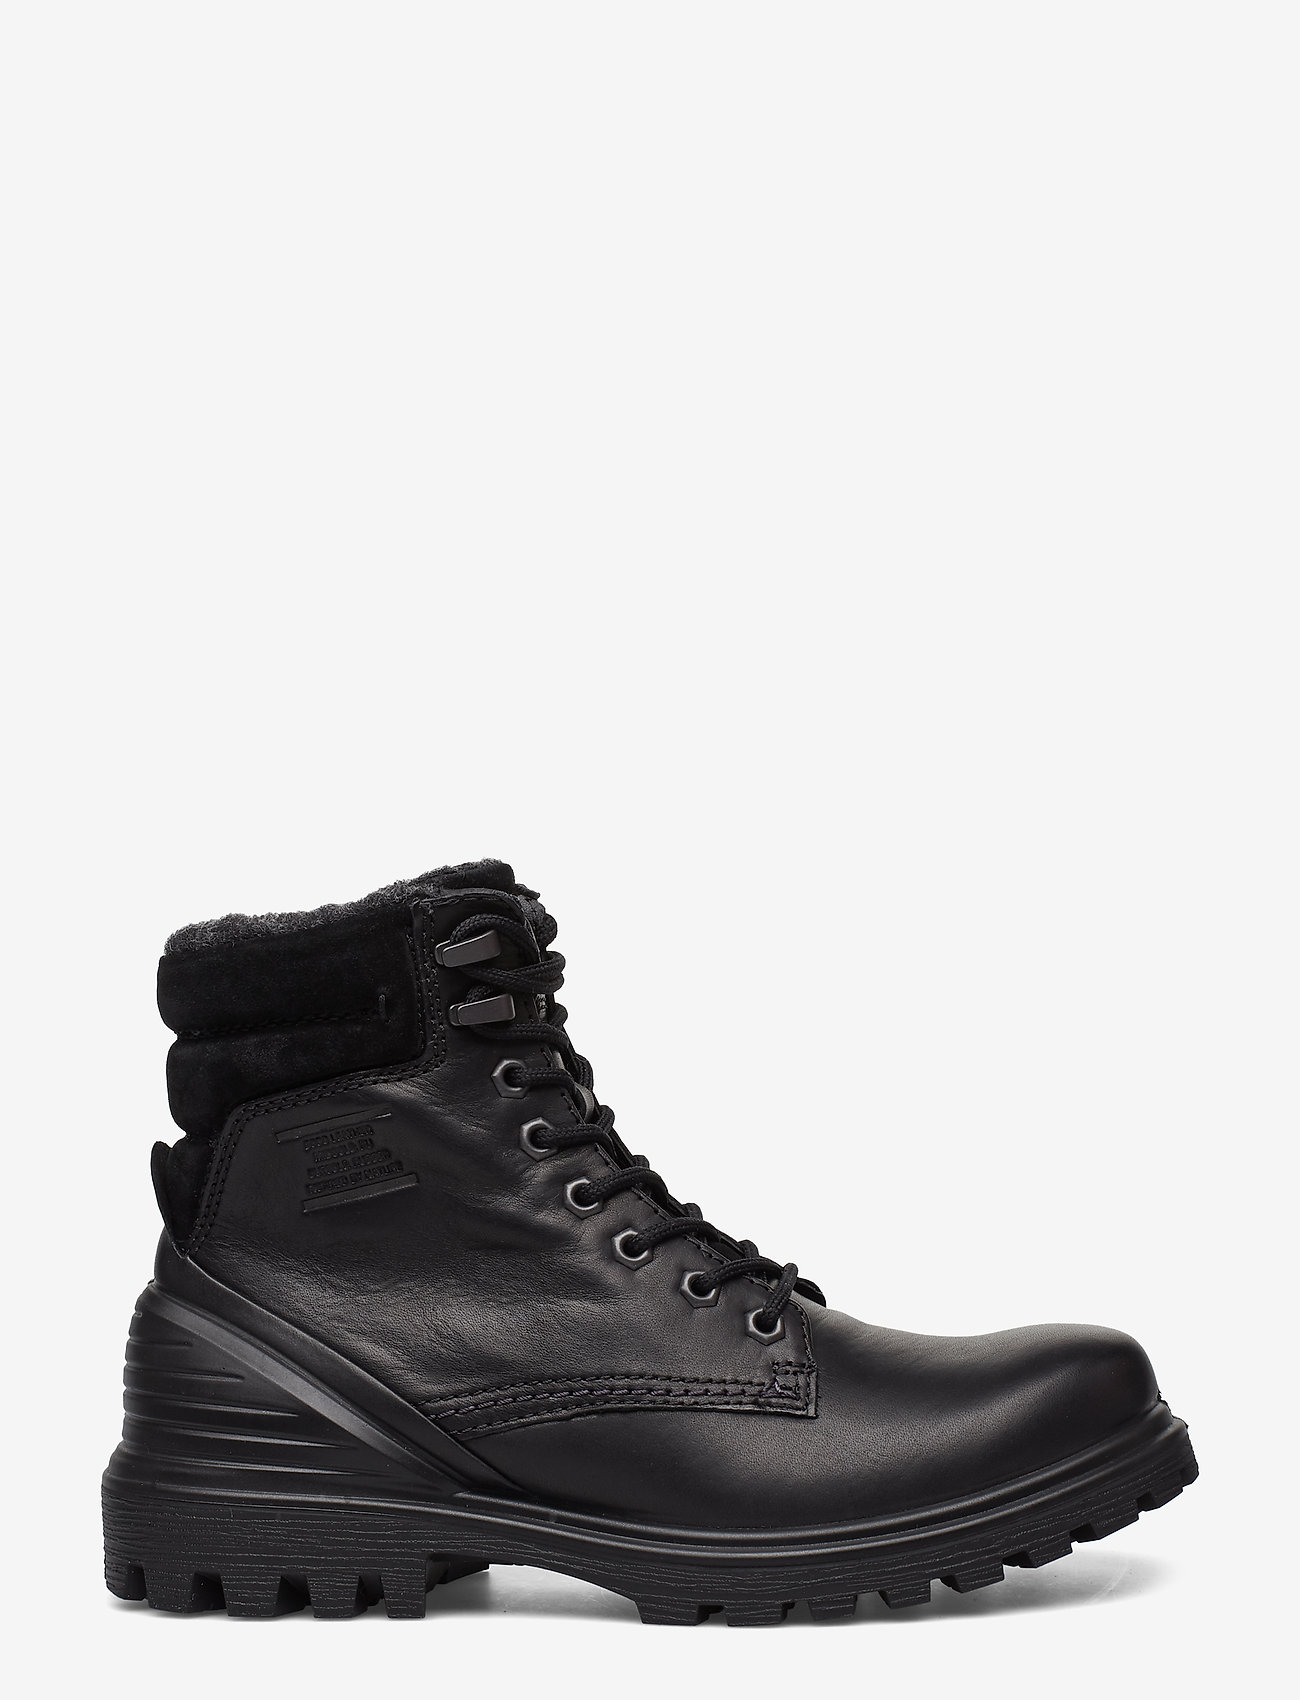 ECCO - TREDTRAY W - flade ankelstøvler - black/black - 1